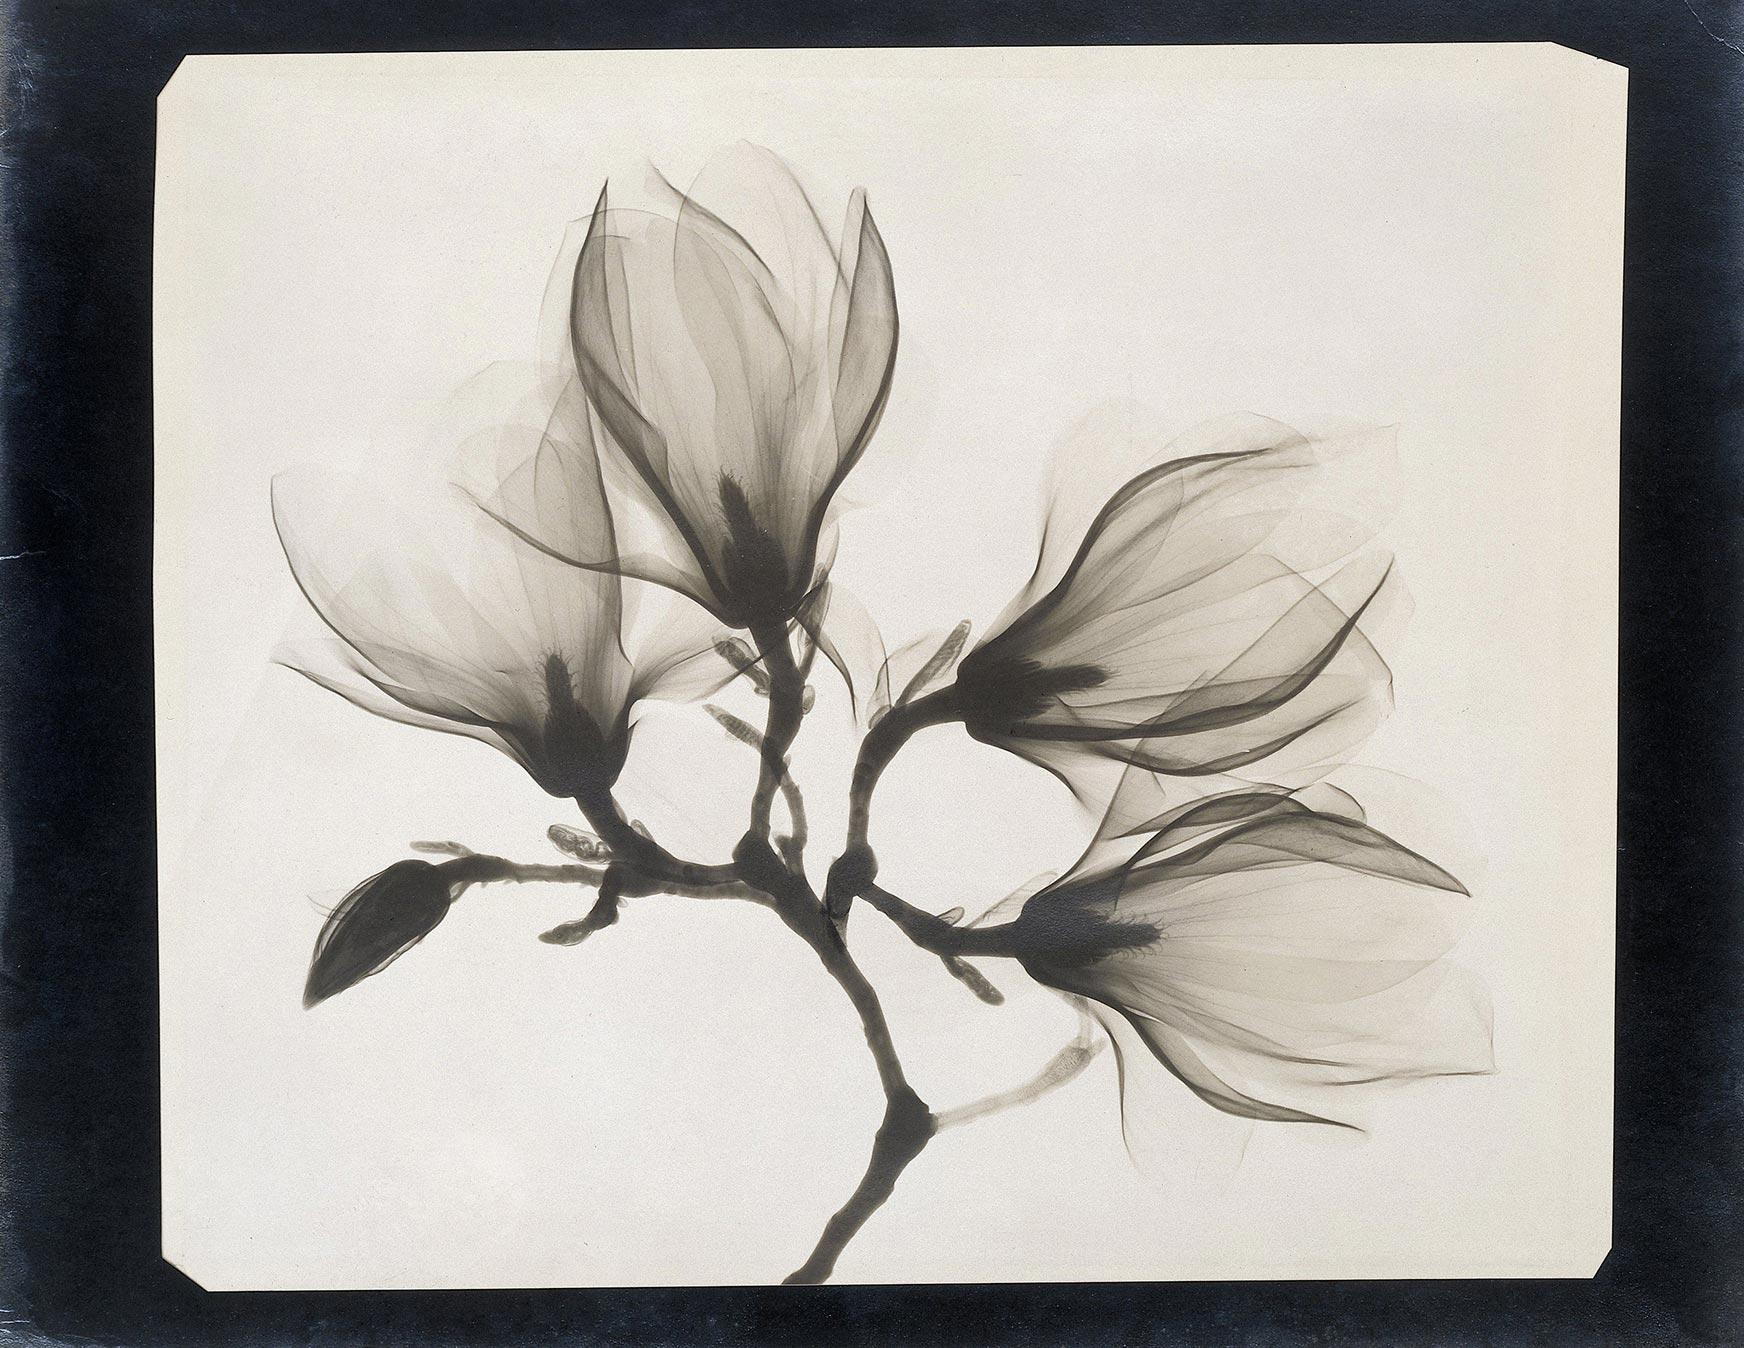 Anoniem, Tak met vier magnolia's 1910-1925. Röntgenstraling. Rijksmuseum